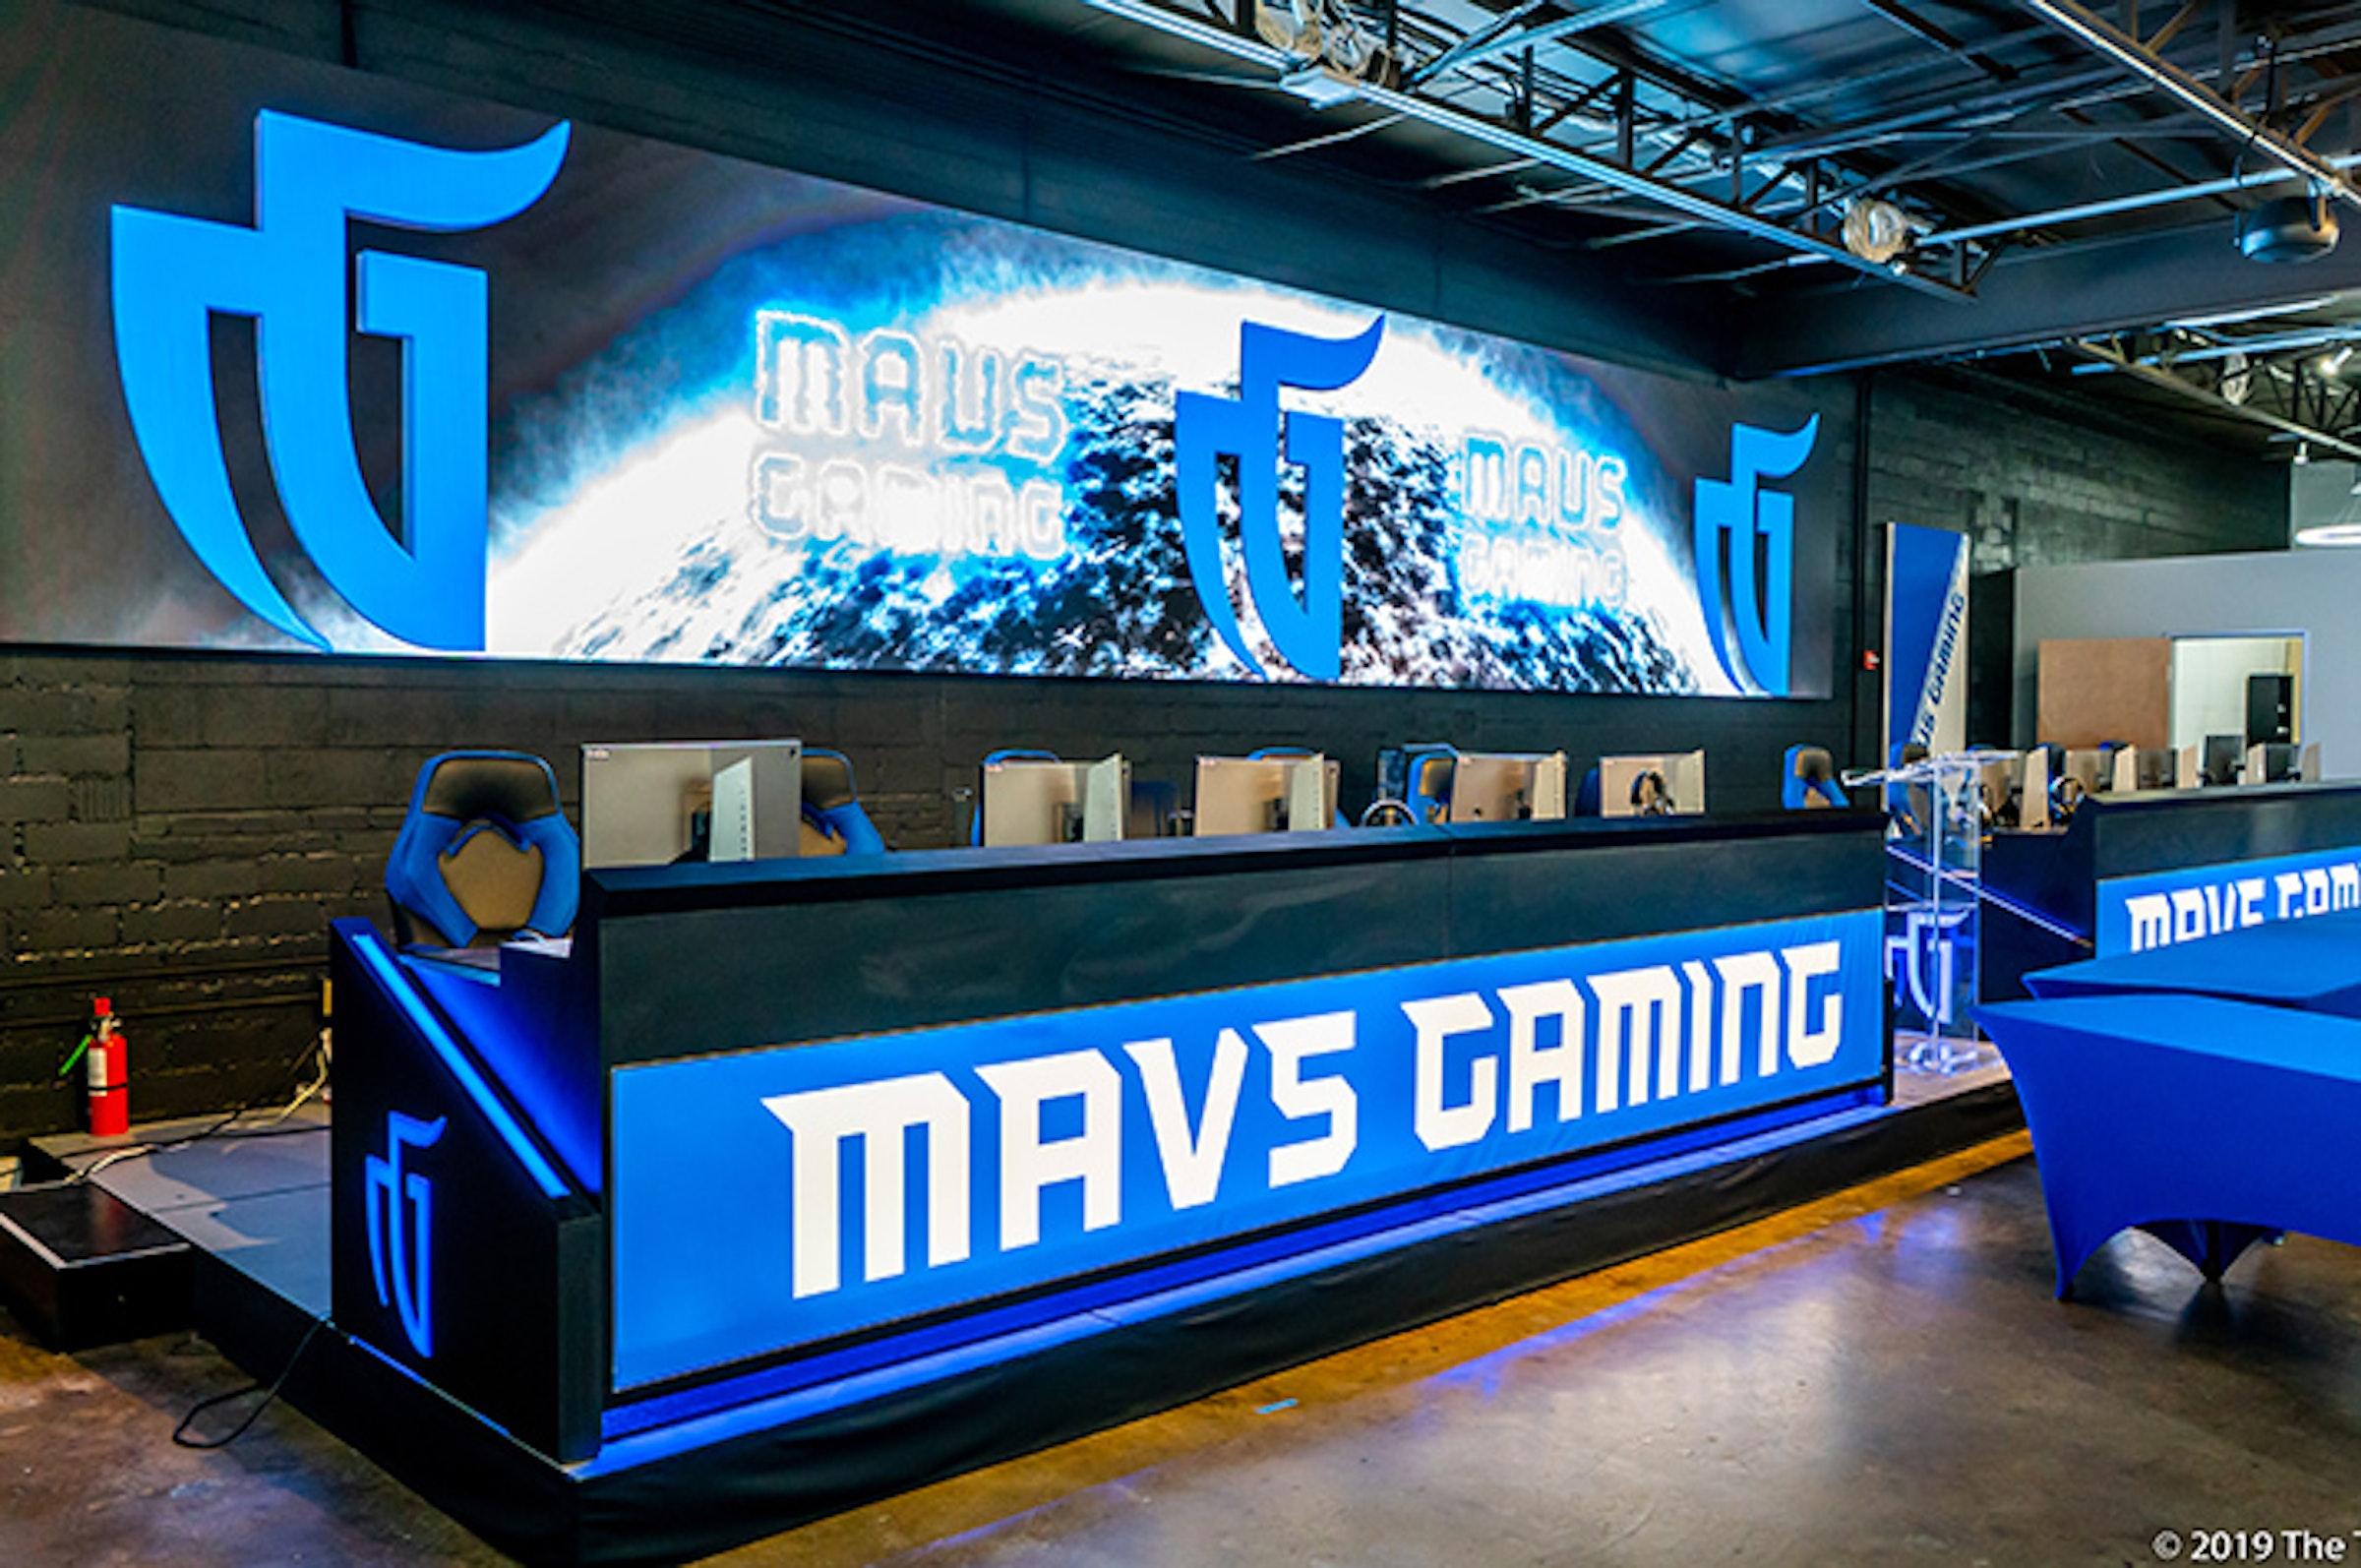 Mavs Gaming Hub in Beyond Dallas